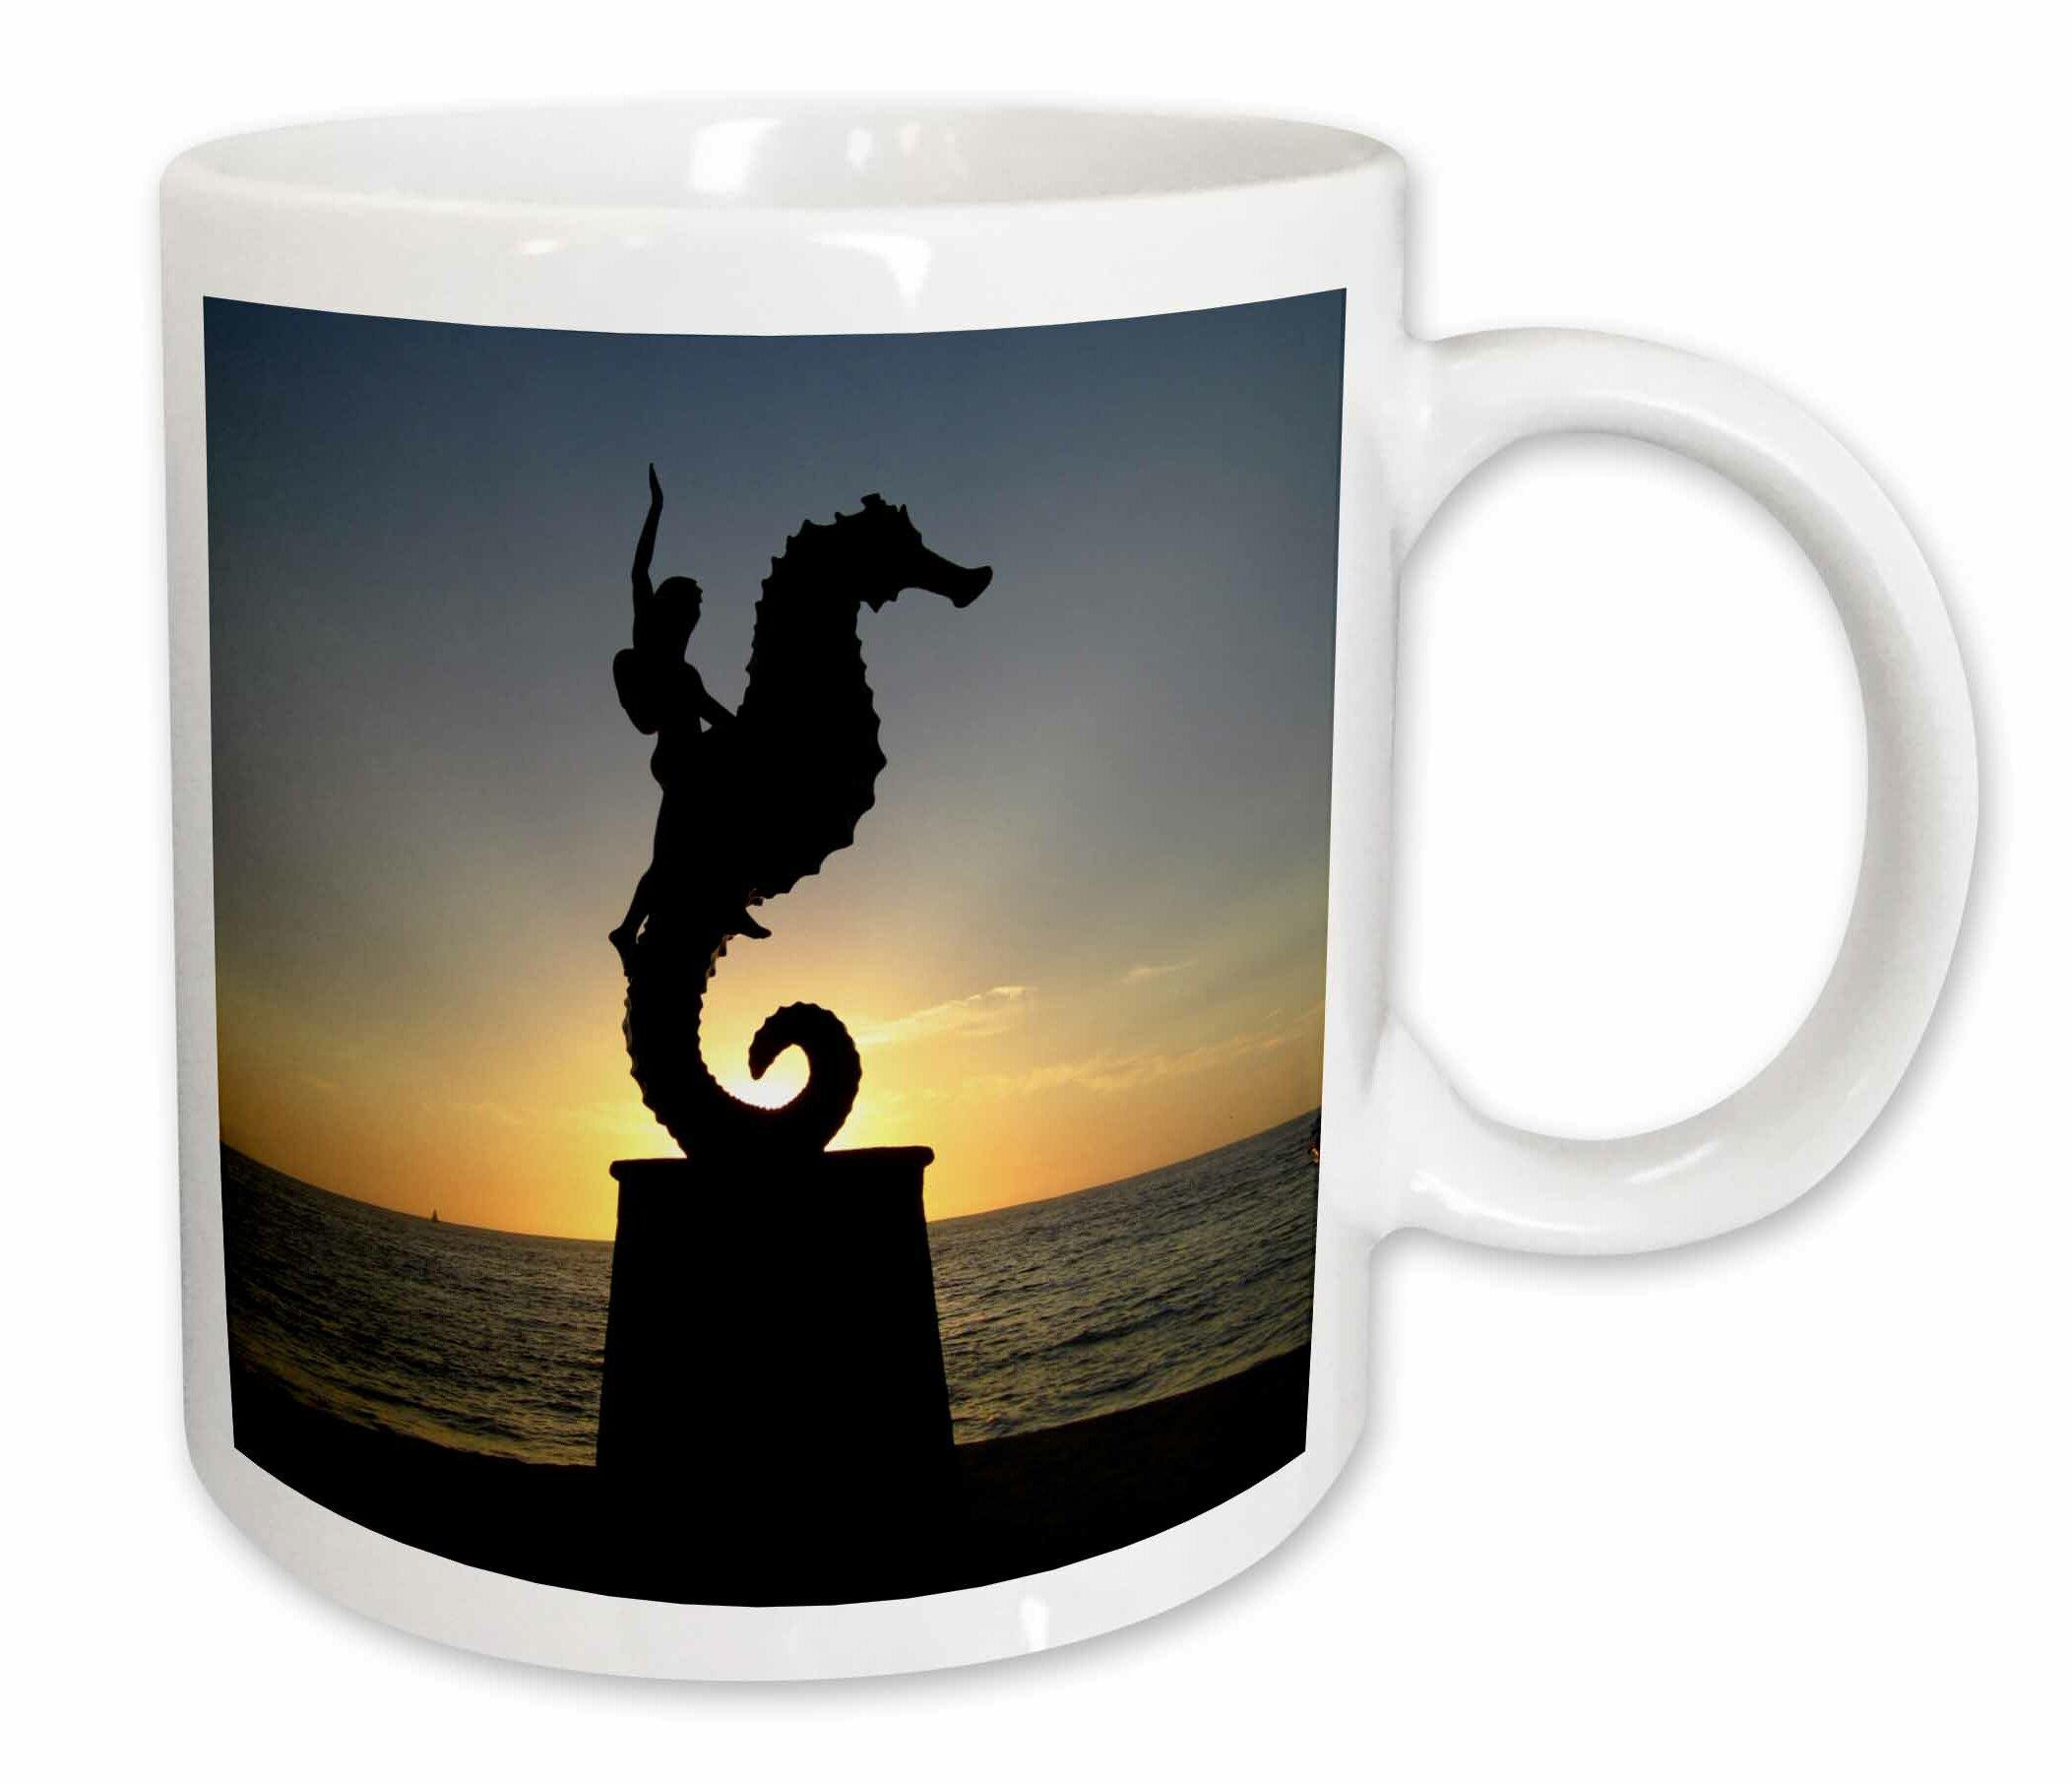 East Urban Home Puerto Vallarta Malecon Boy On Seahorse Statue Silhouetted Against Sunset Coffee Mug Wayfair